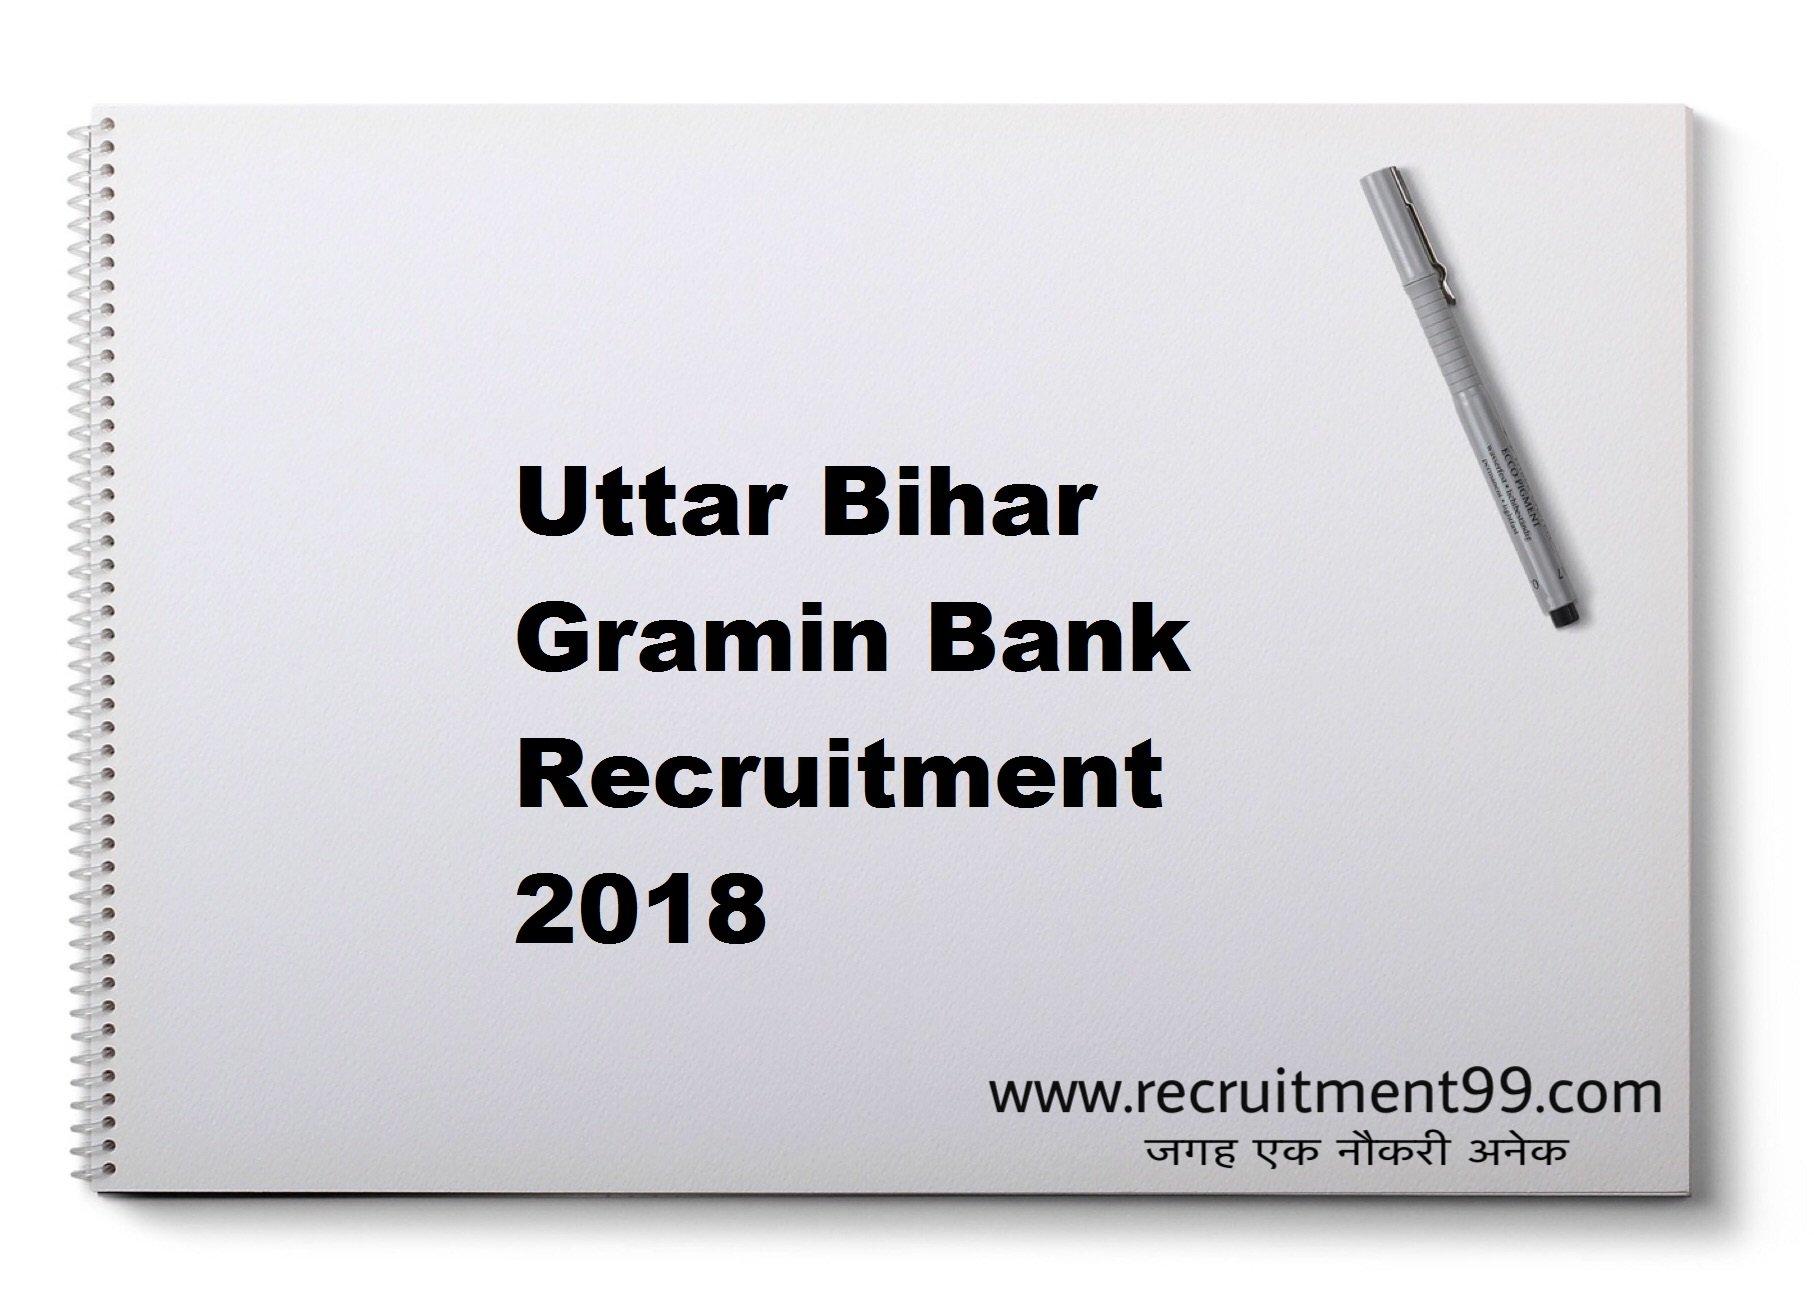 Uttar Bihar Gramin Bank Online Office Assistant & Officer Scale Recruitment 2018